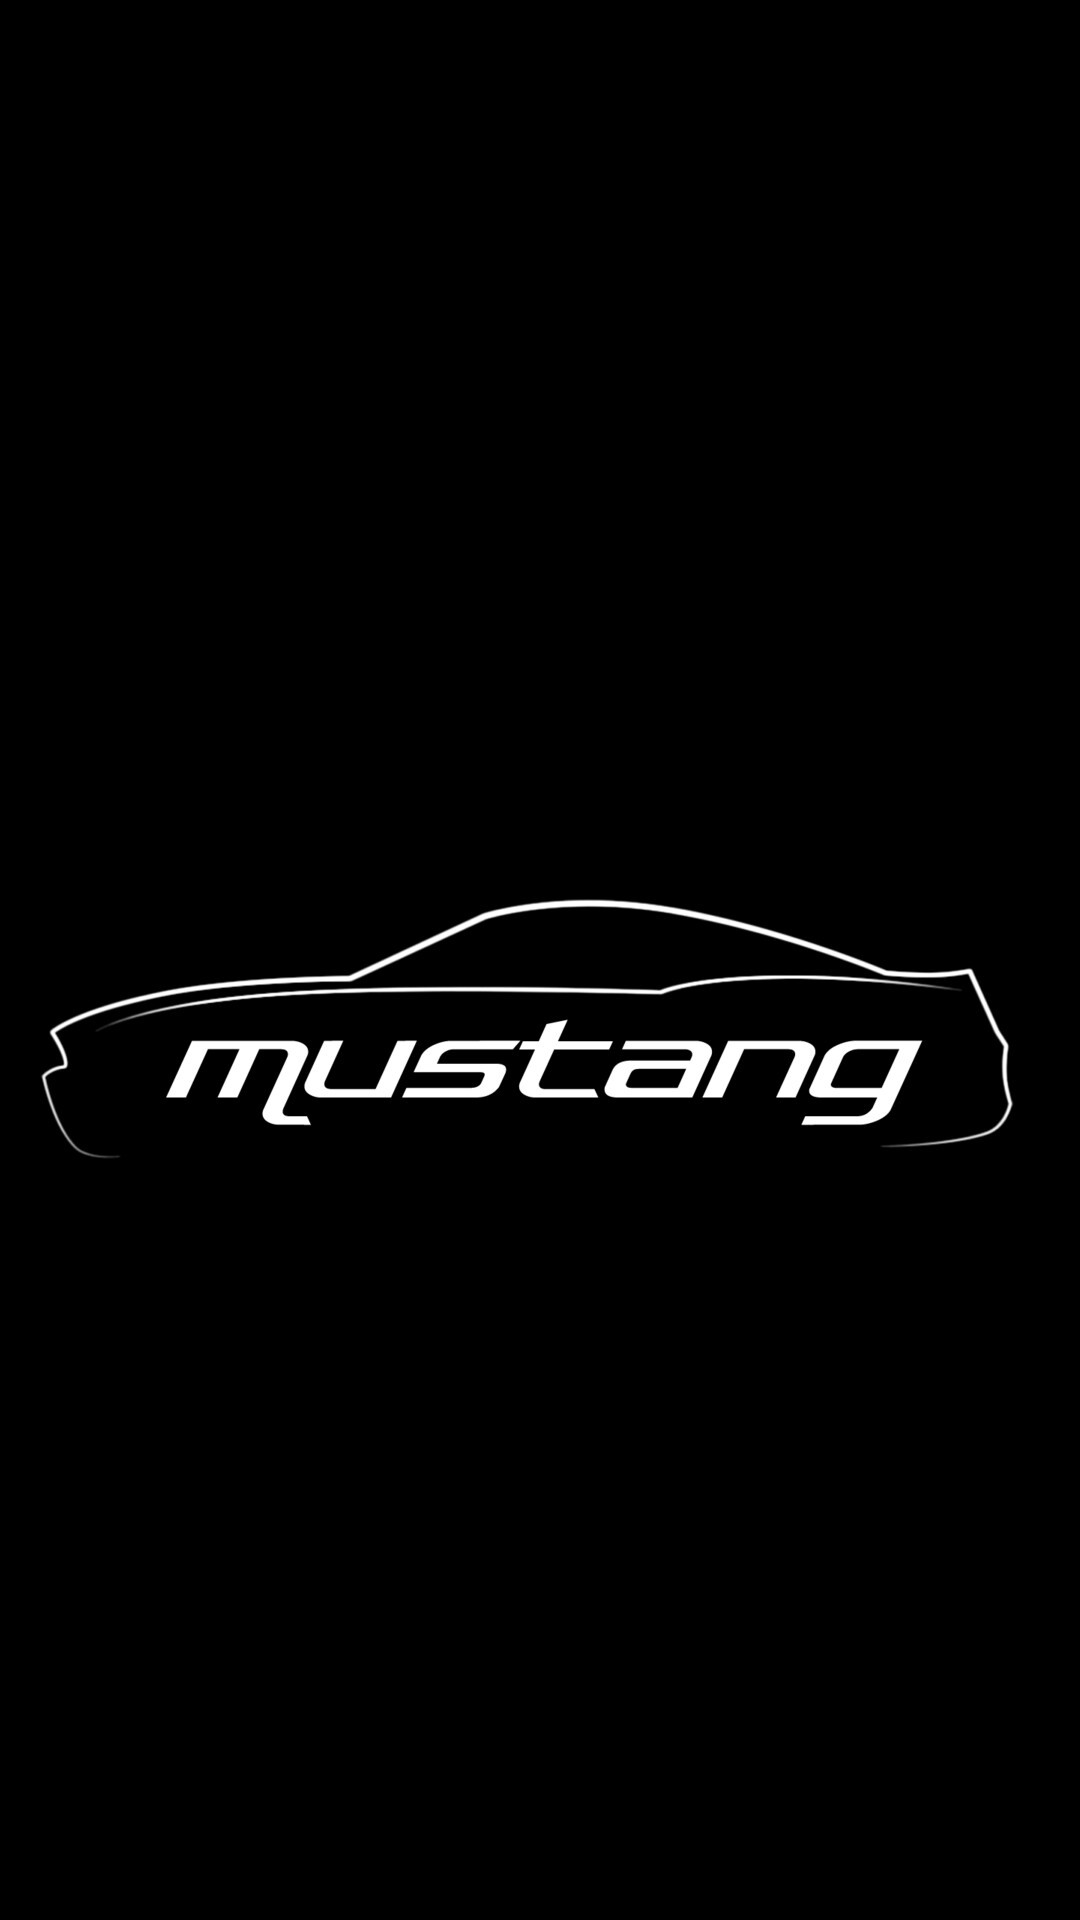 mustang emblem wallpaper (55+ images)